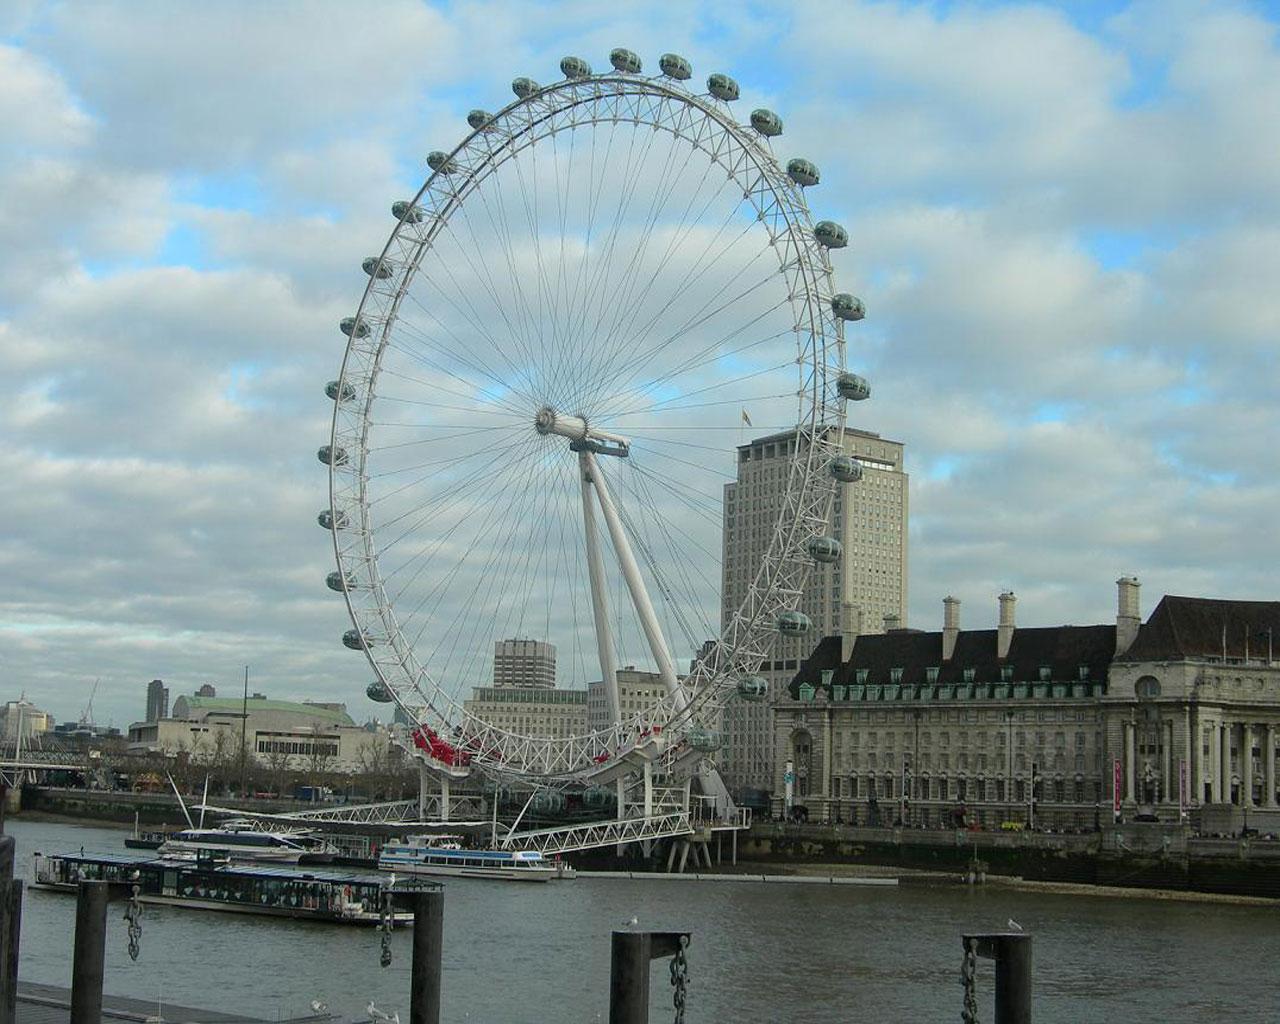 Best city - london - london eye 1280x1024 wallpaper #2